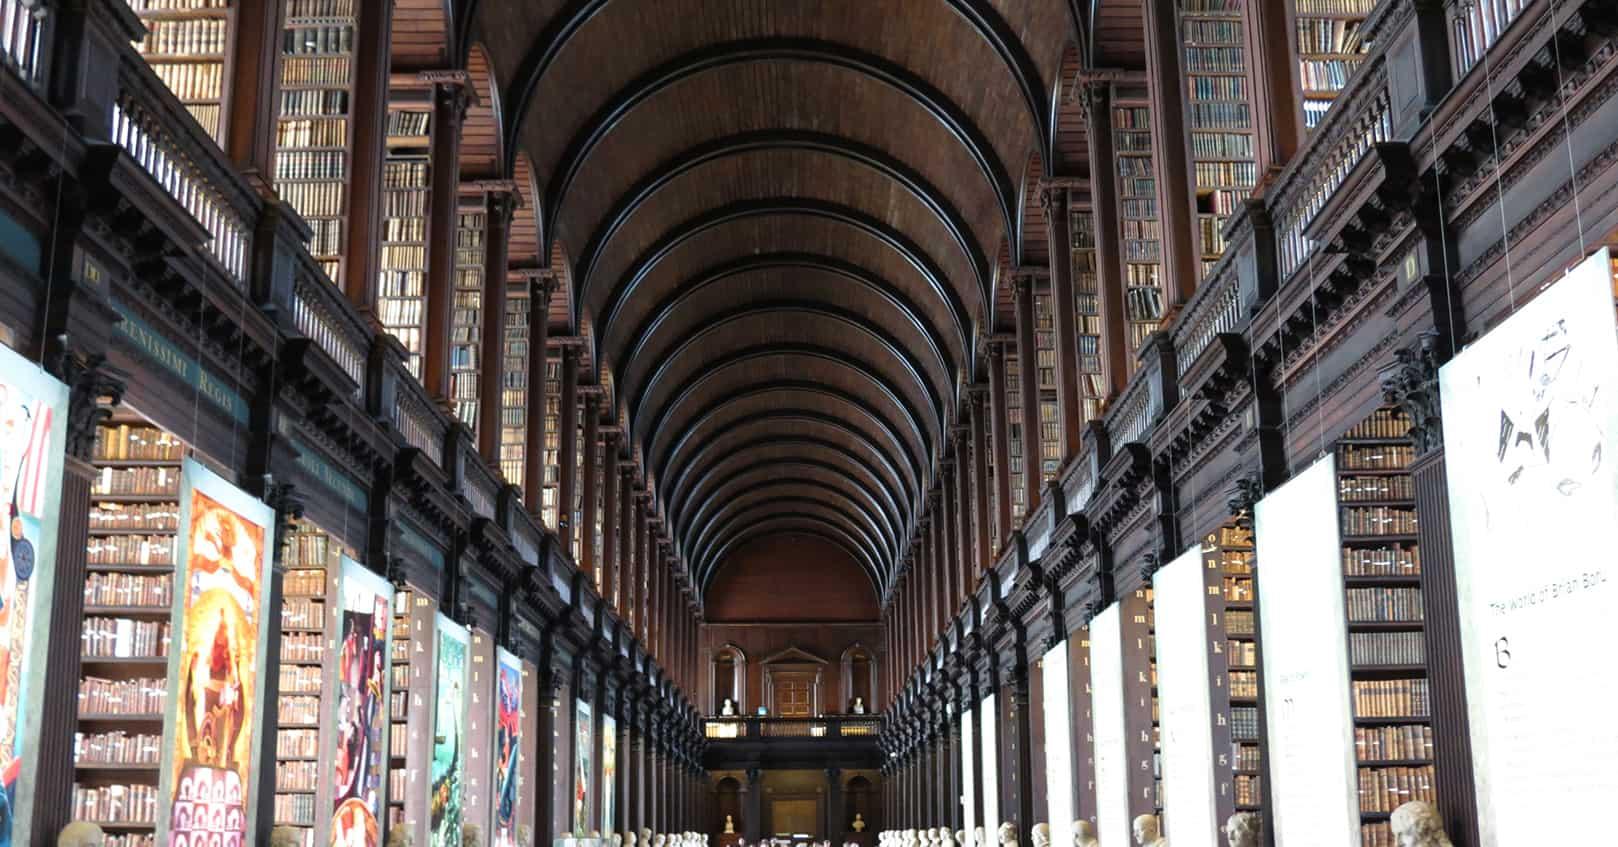 Kells Library